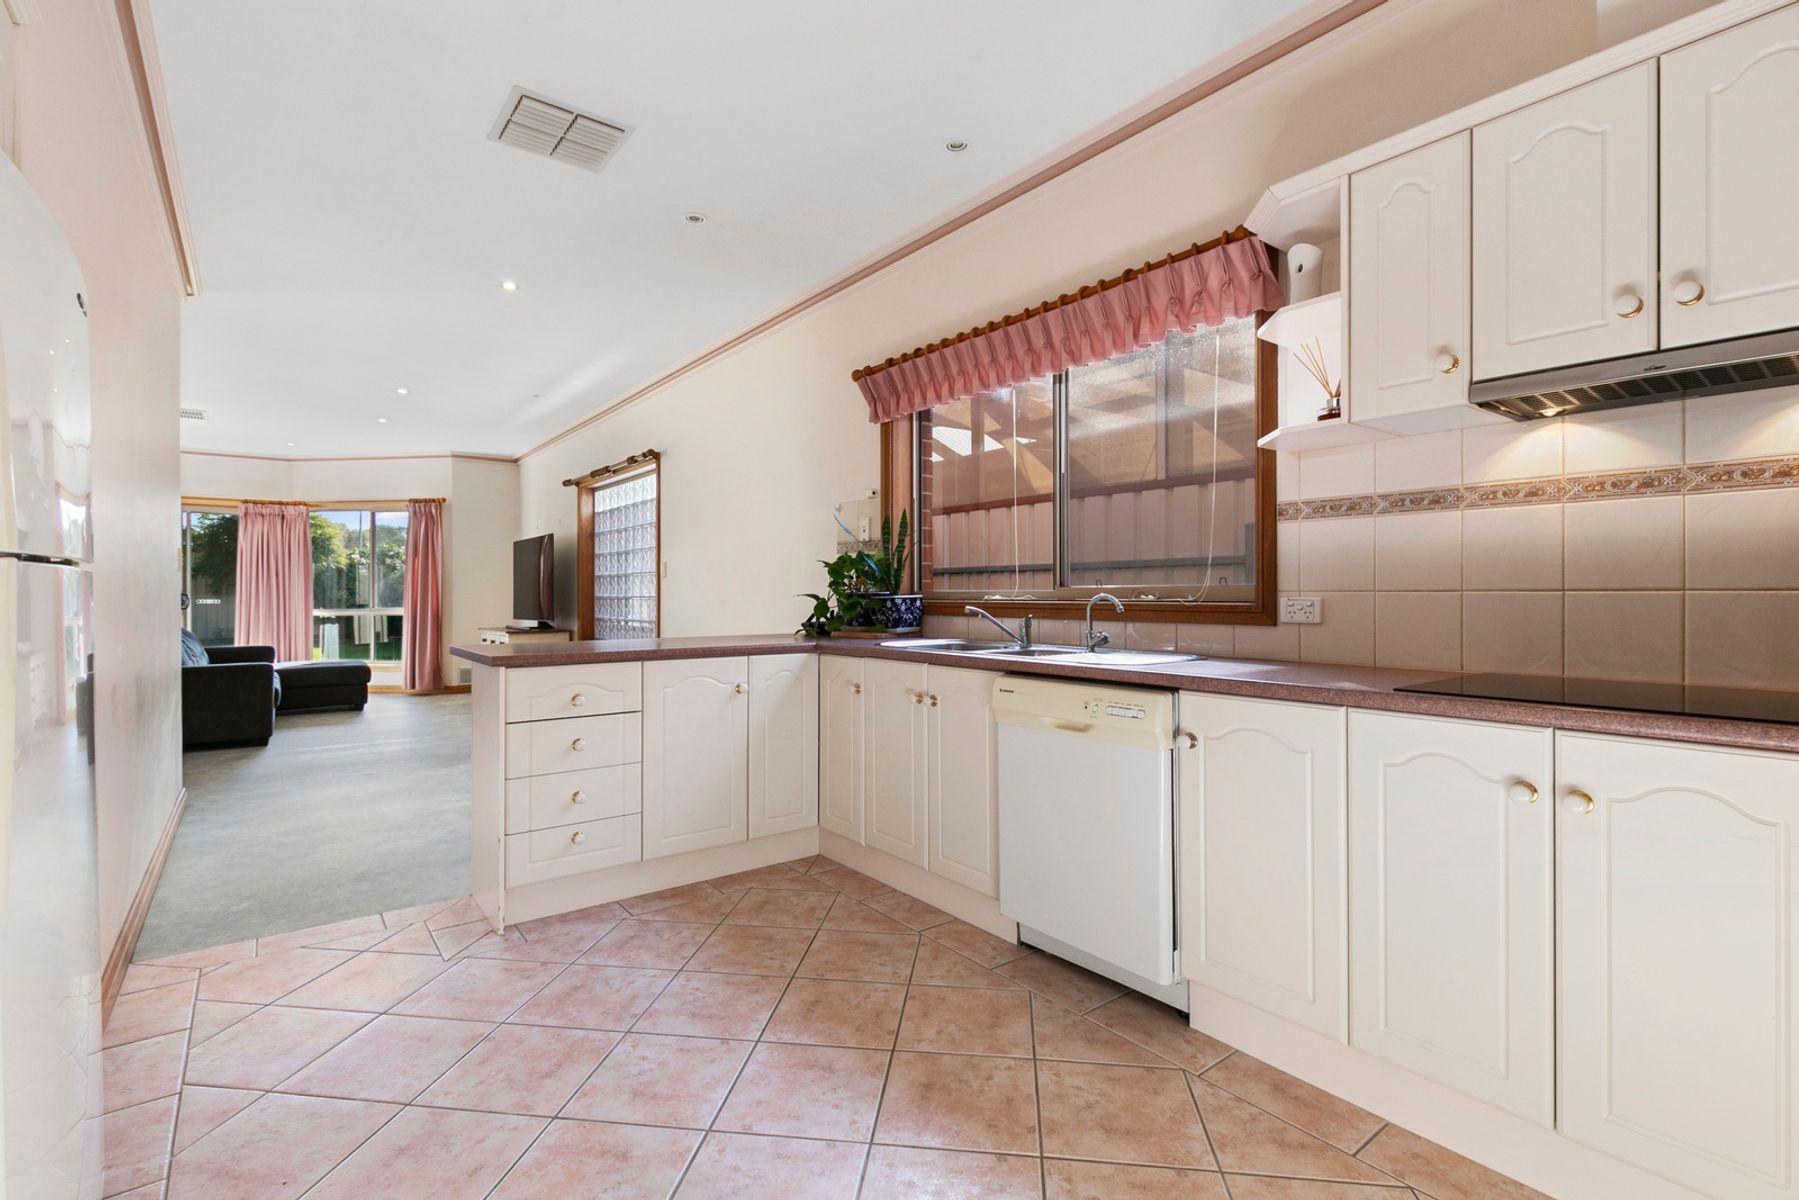 7A Coronation Road, Strathalbyn, SA 5255